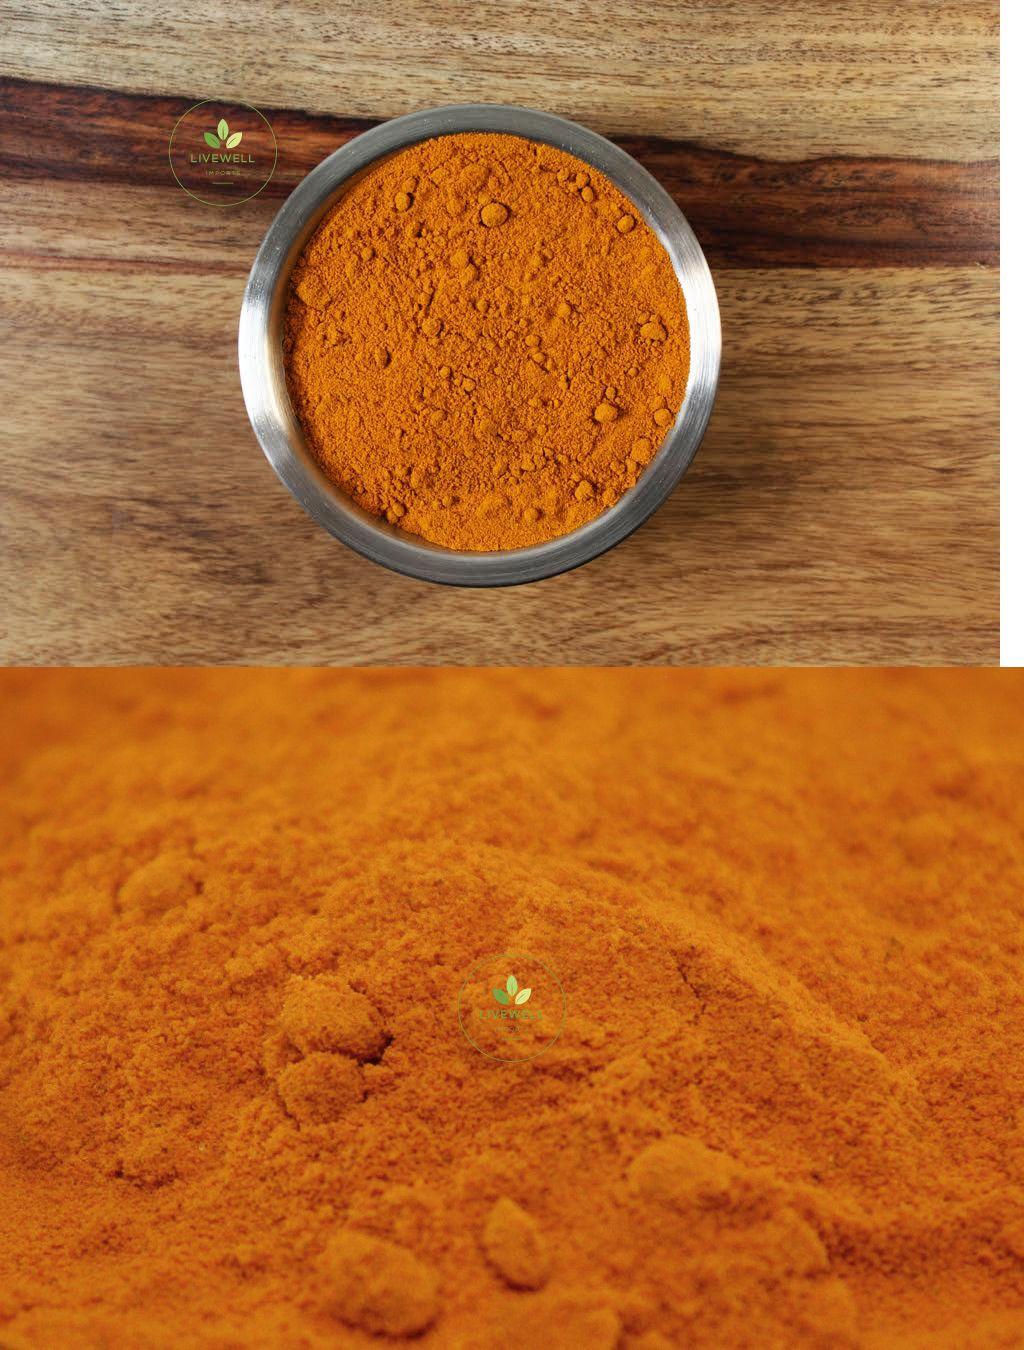 Bulk herbs wholesale - Herbs And Botanicals Usda Certified Organic Turmeric Root Powder Kosher 1lb 20lb Bulk Wholesale